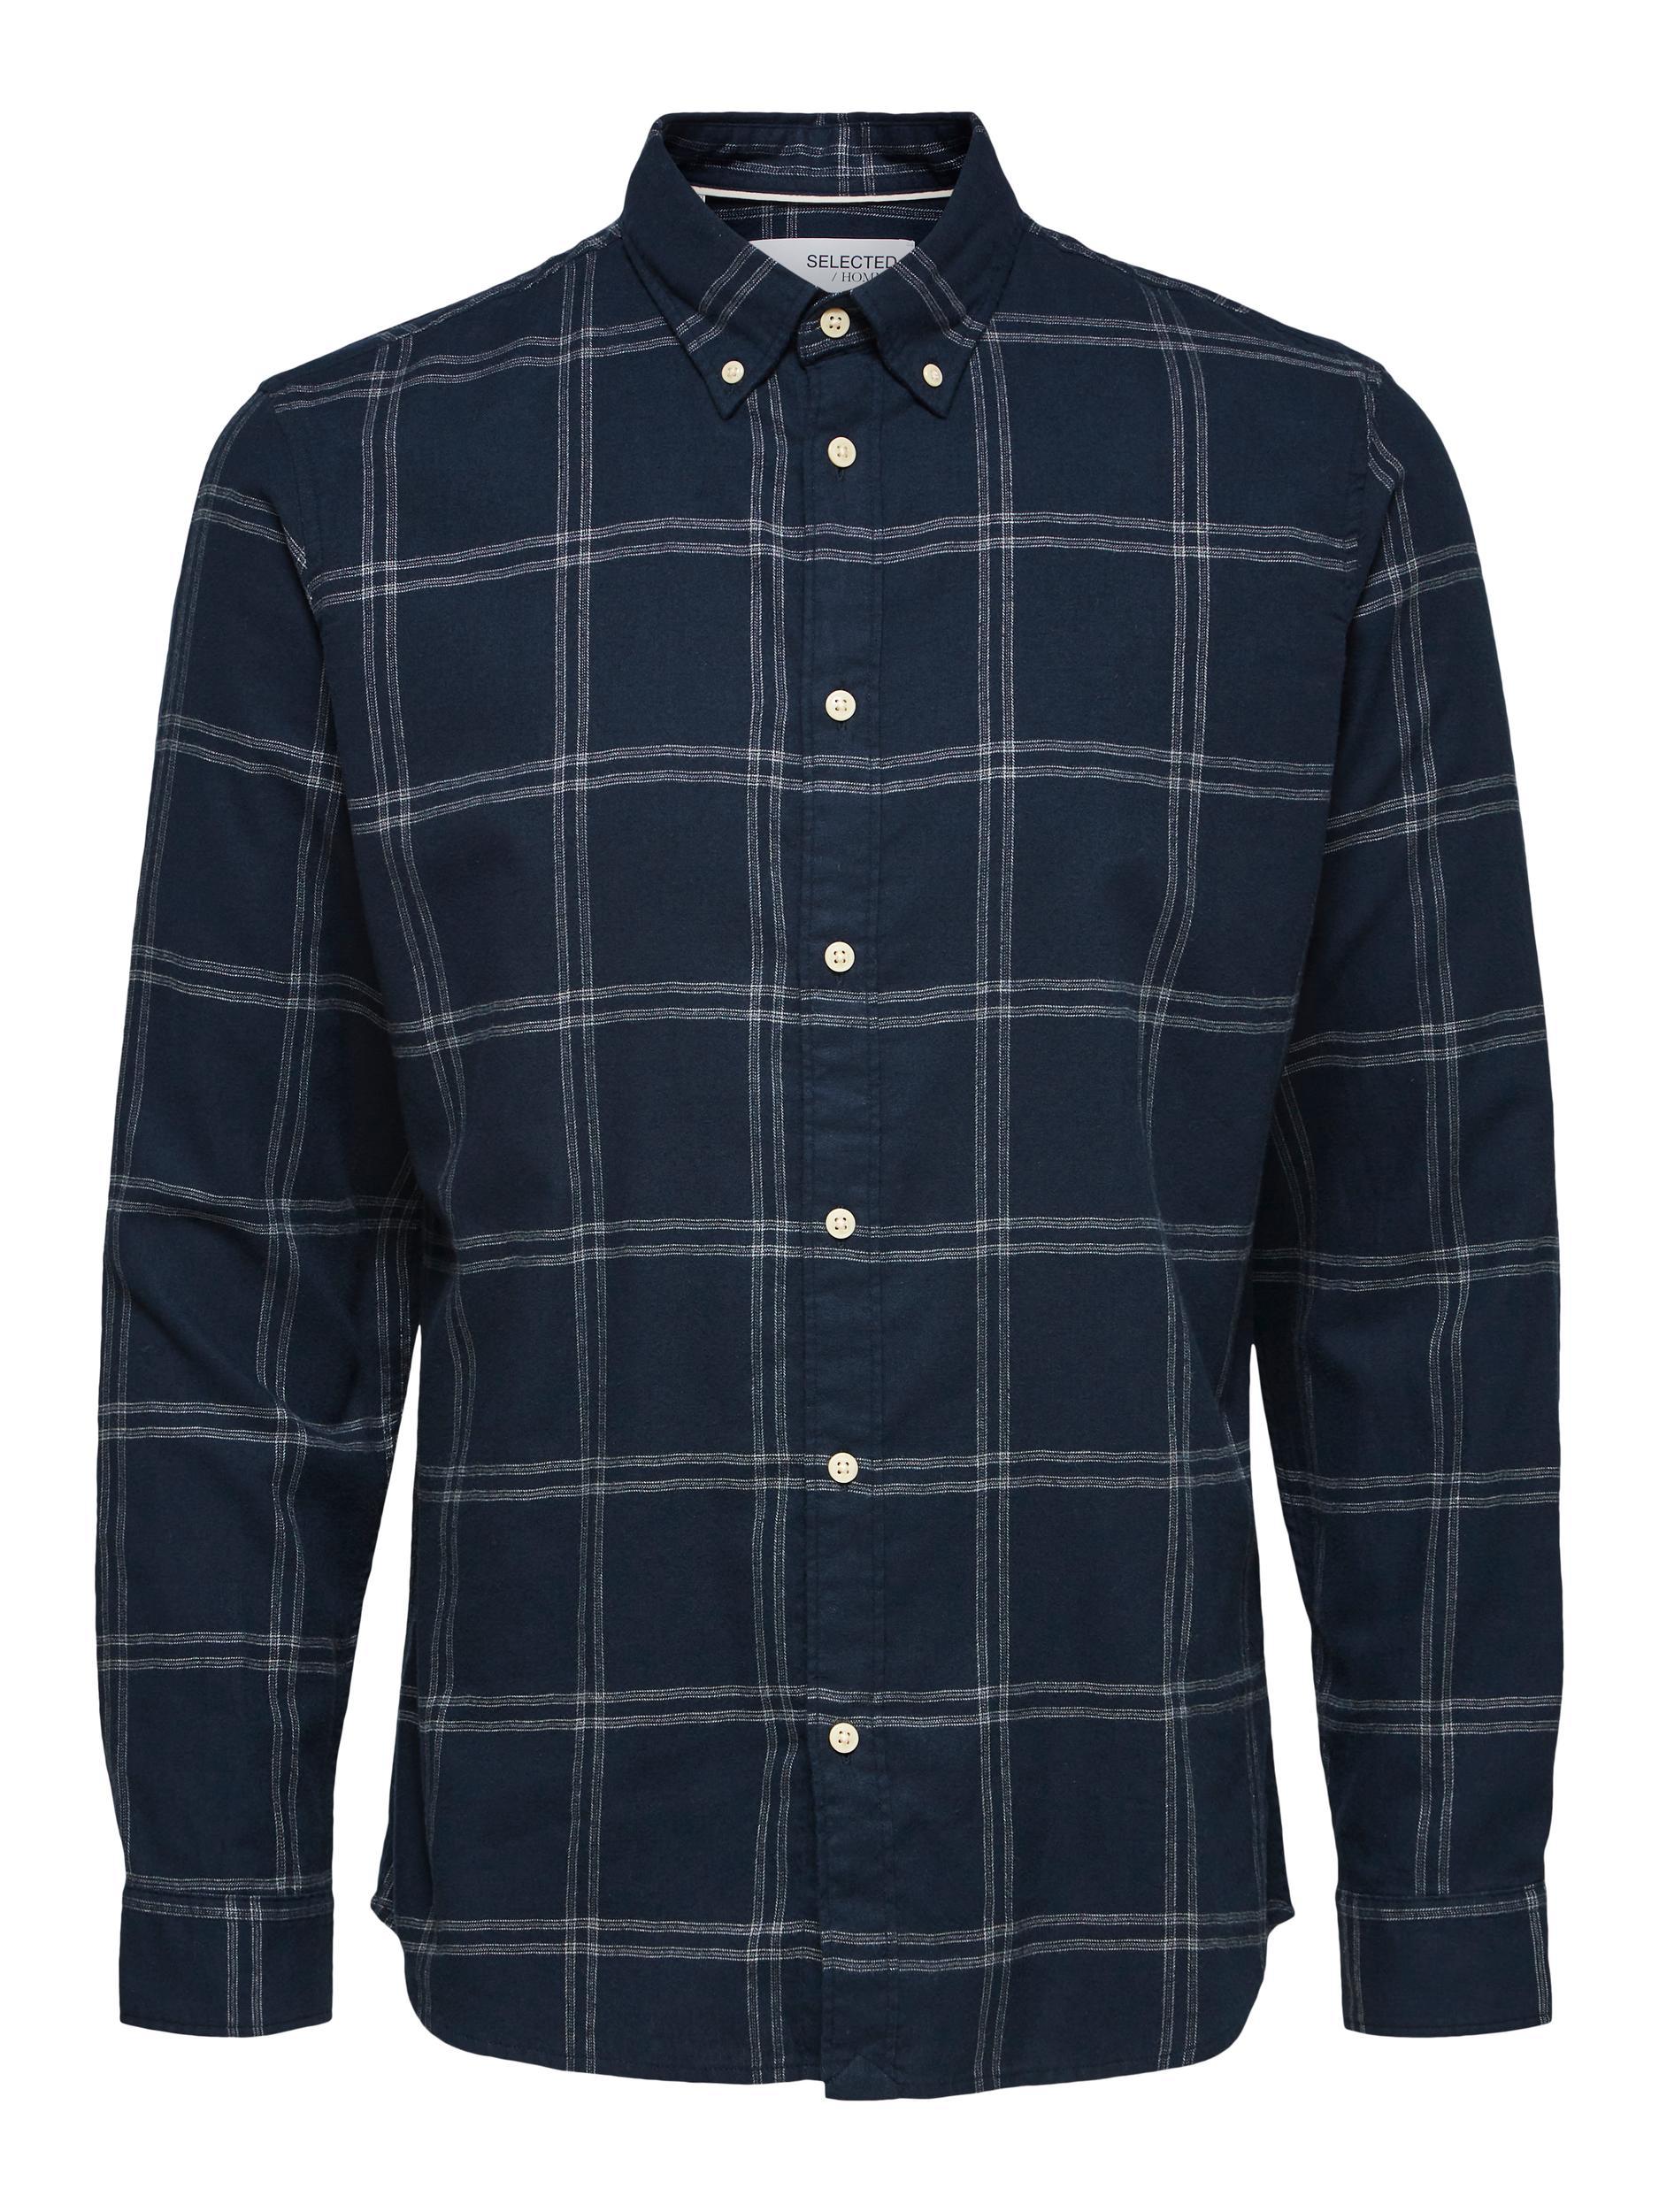 Selected Homme Flannel Slim skjorte, mood indigo, medium